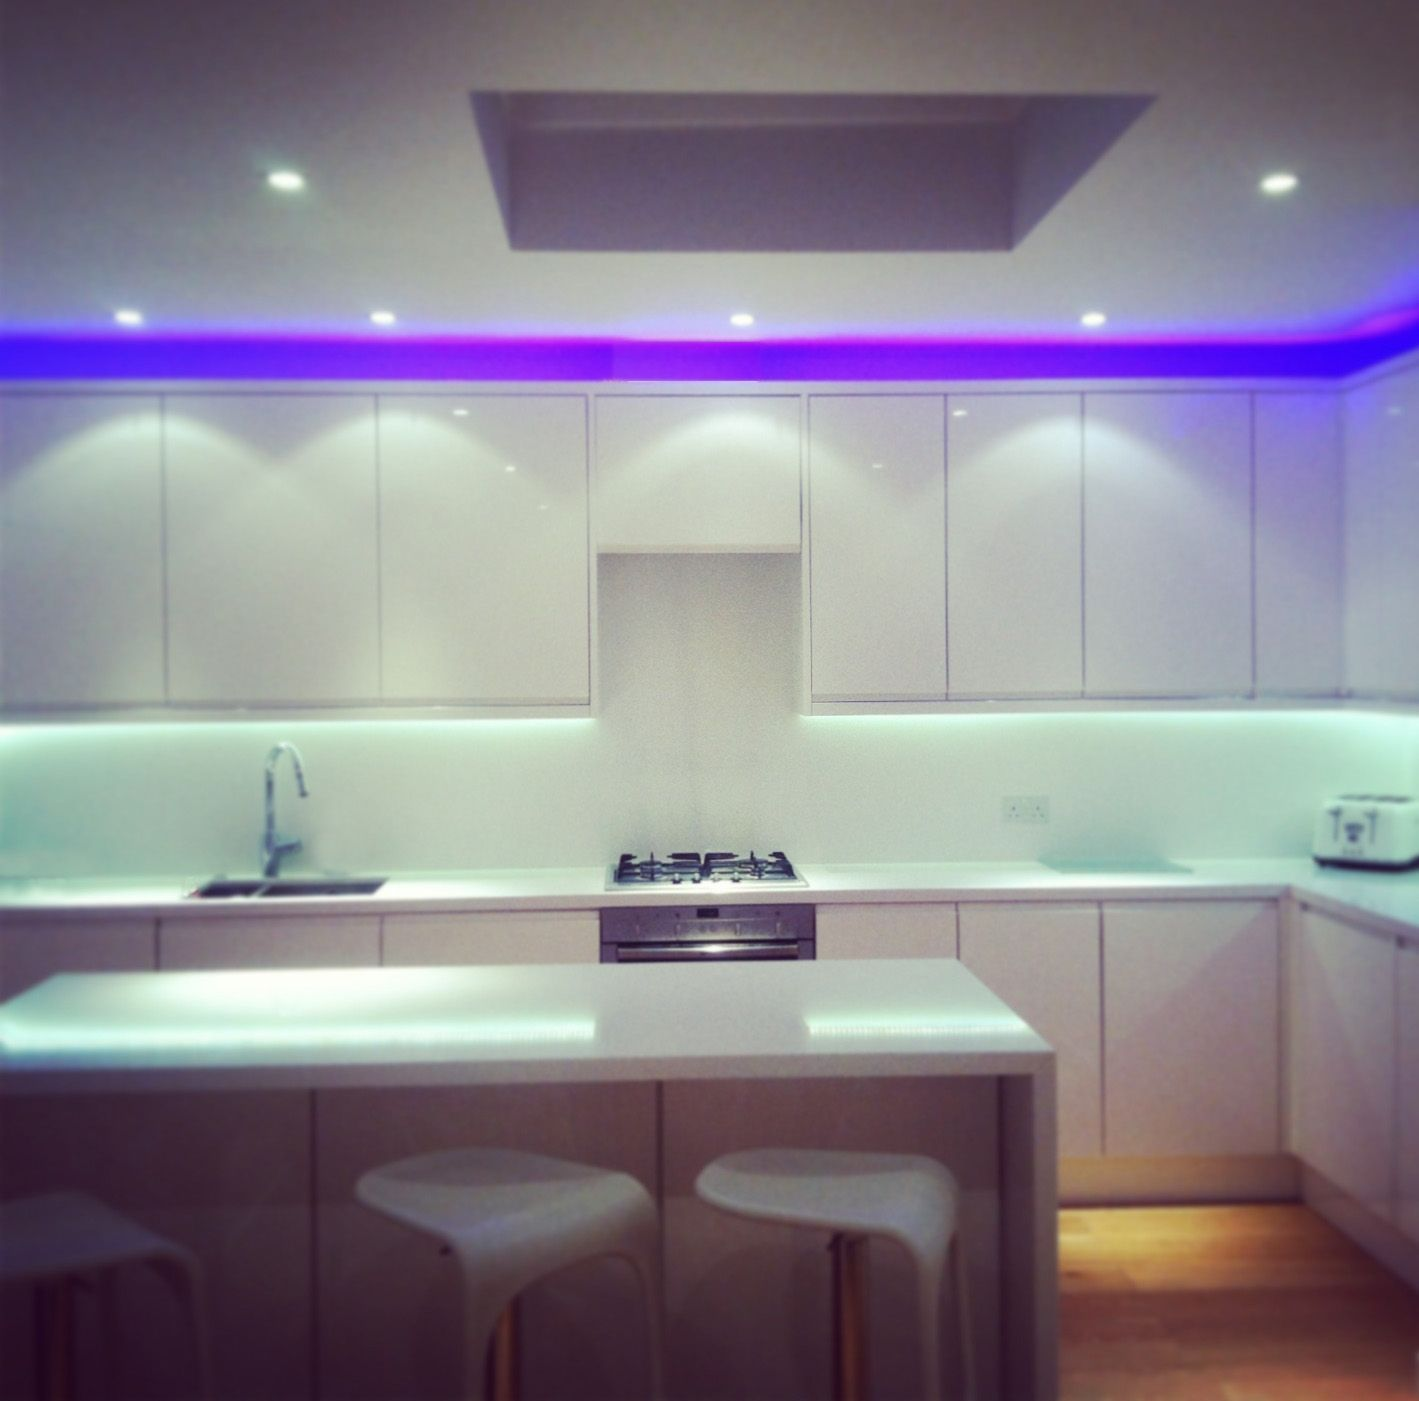 Best Kitchen Gallery: Led Light Bar For Kitchen Ceiling Sinhvienthienan of Led Light Bars For Kitchen on rachelxblog.com